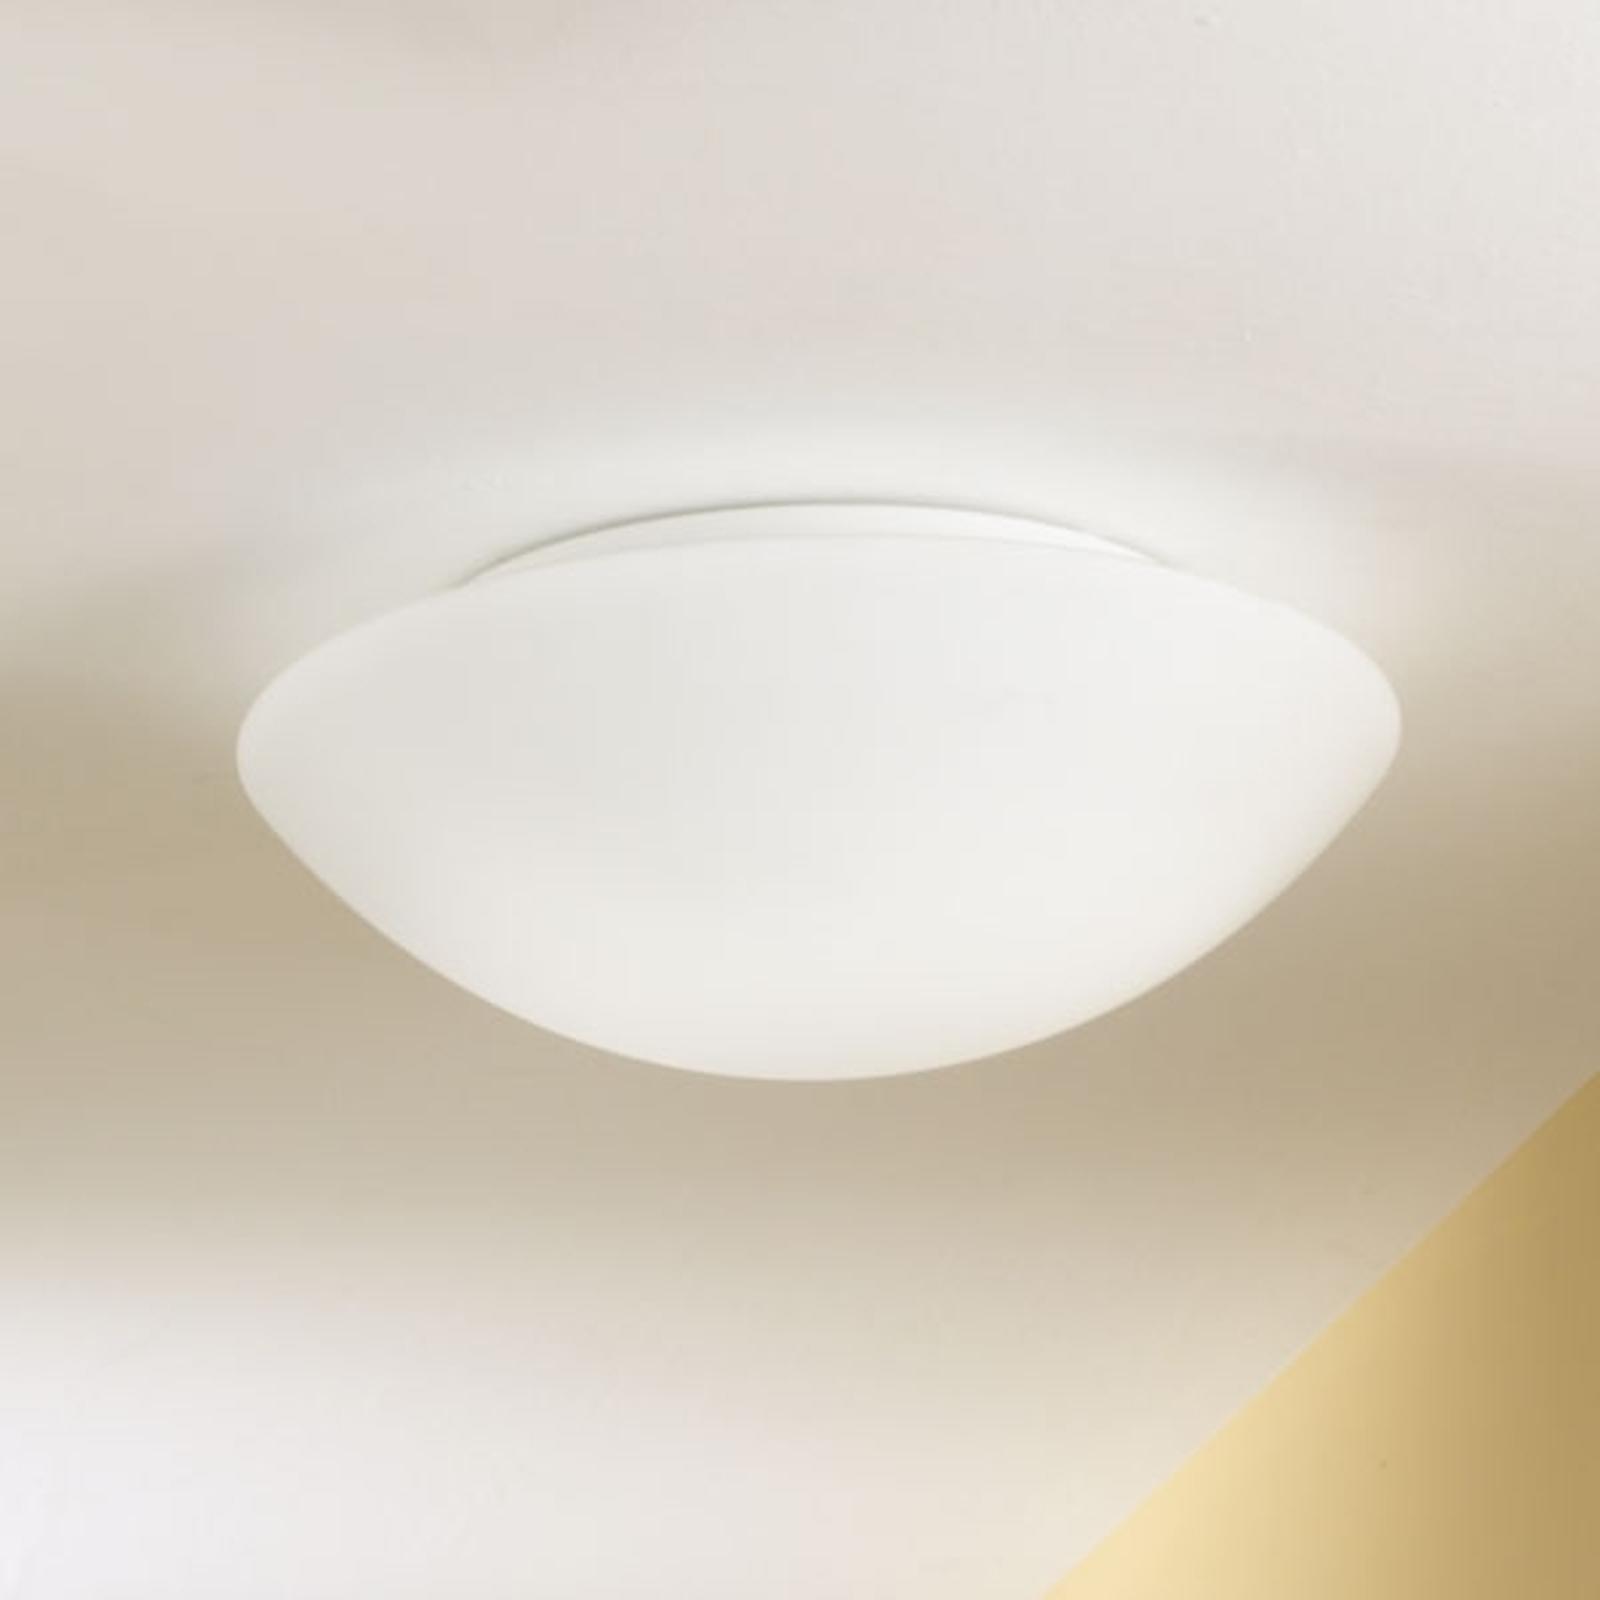 Ceiling and wall light PANDORA_3501362_1